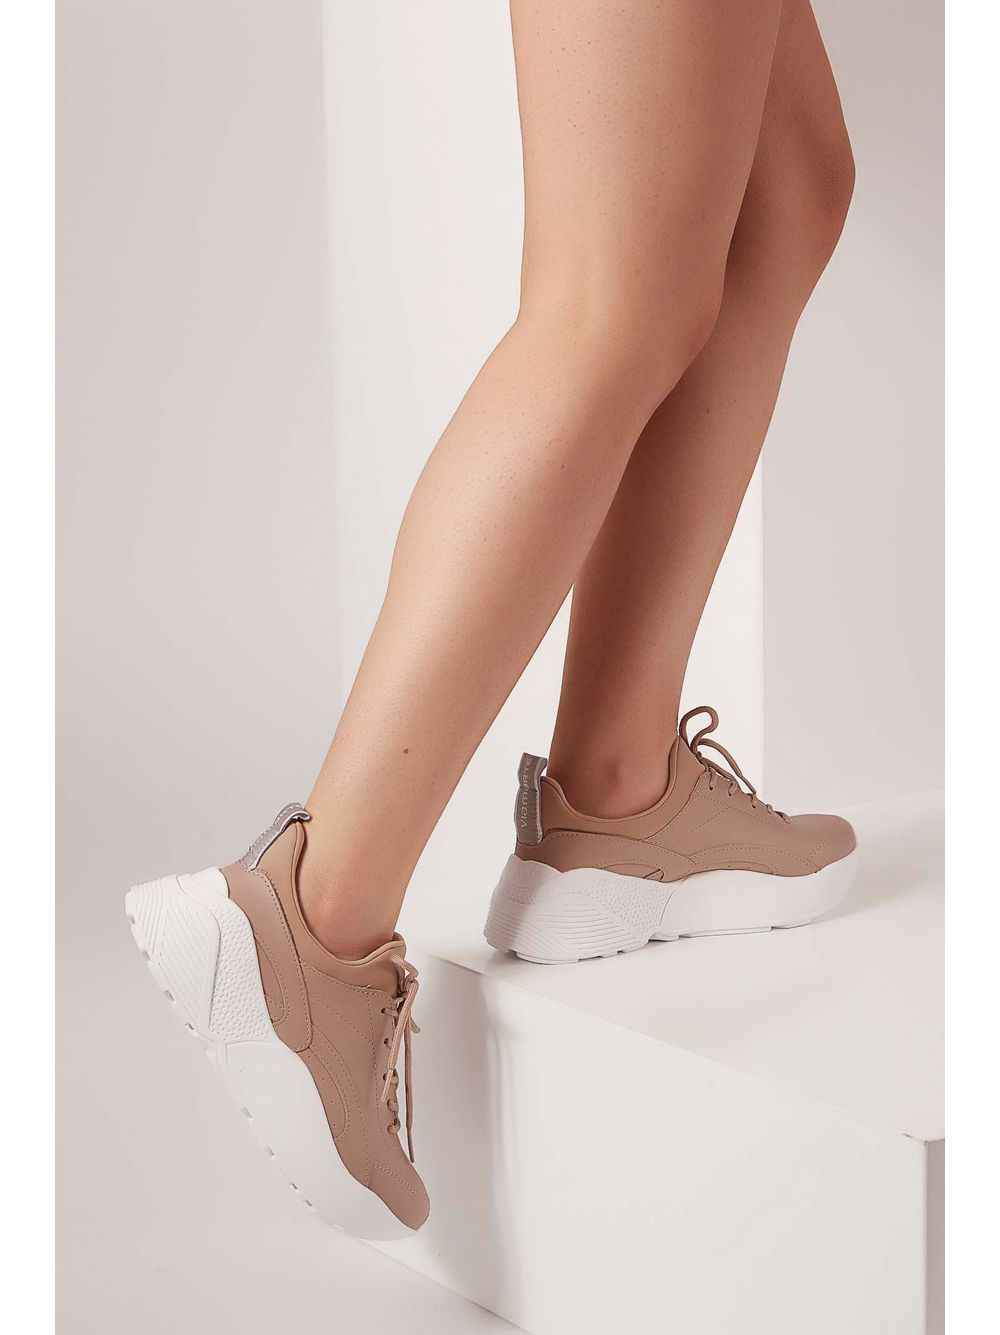 963222a531 Tênis Casual Via Marte Chunky Sneaker Bege - pittol